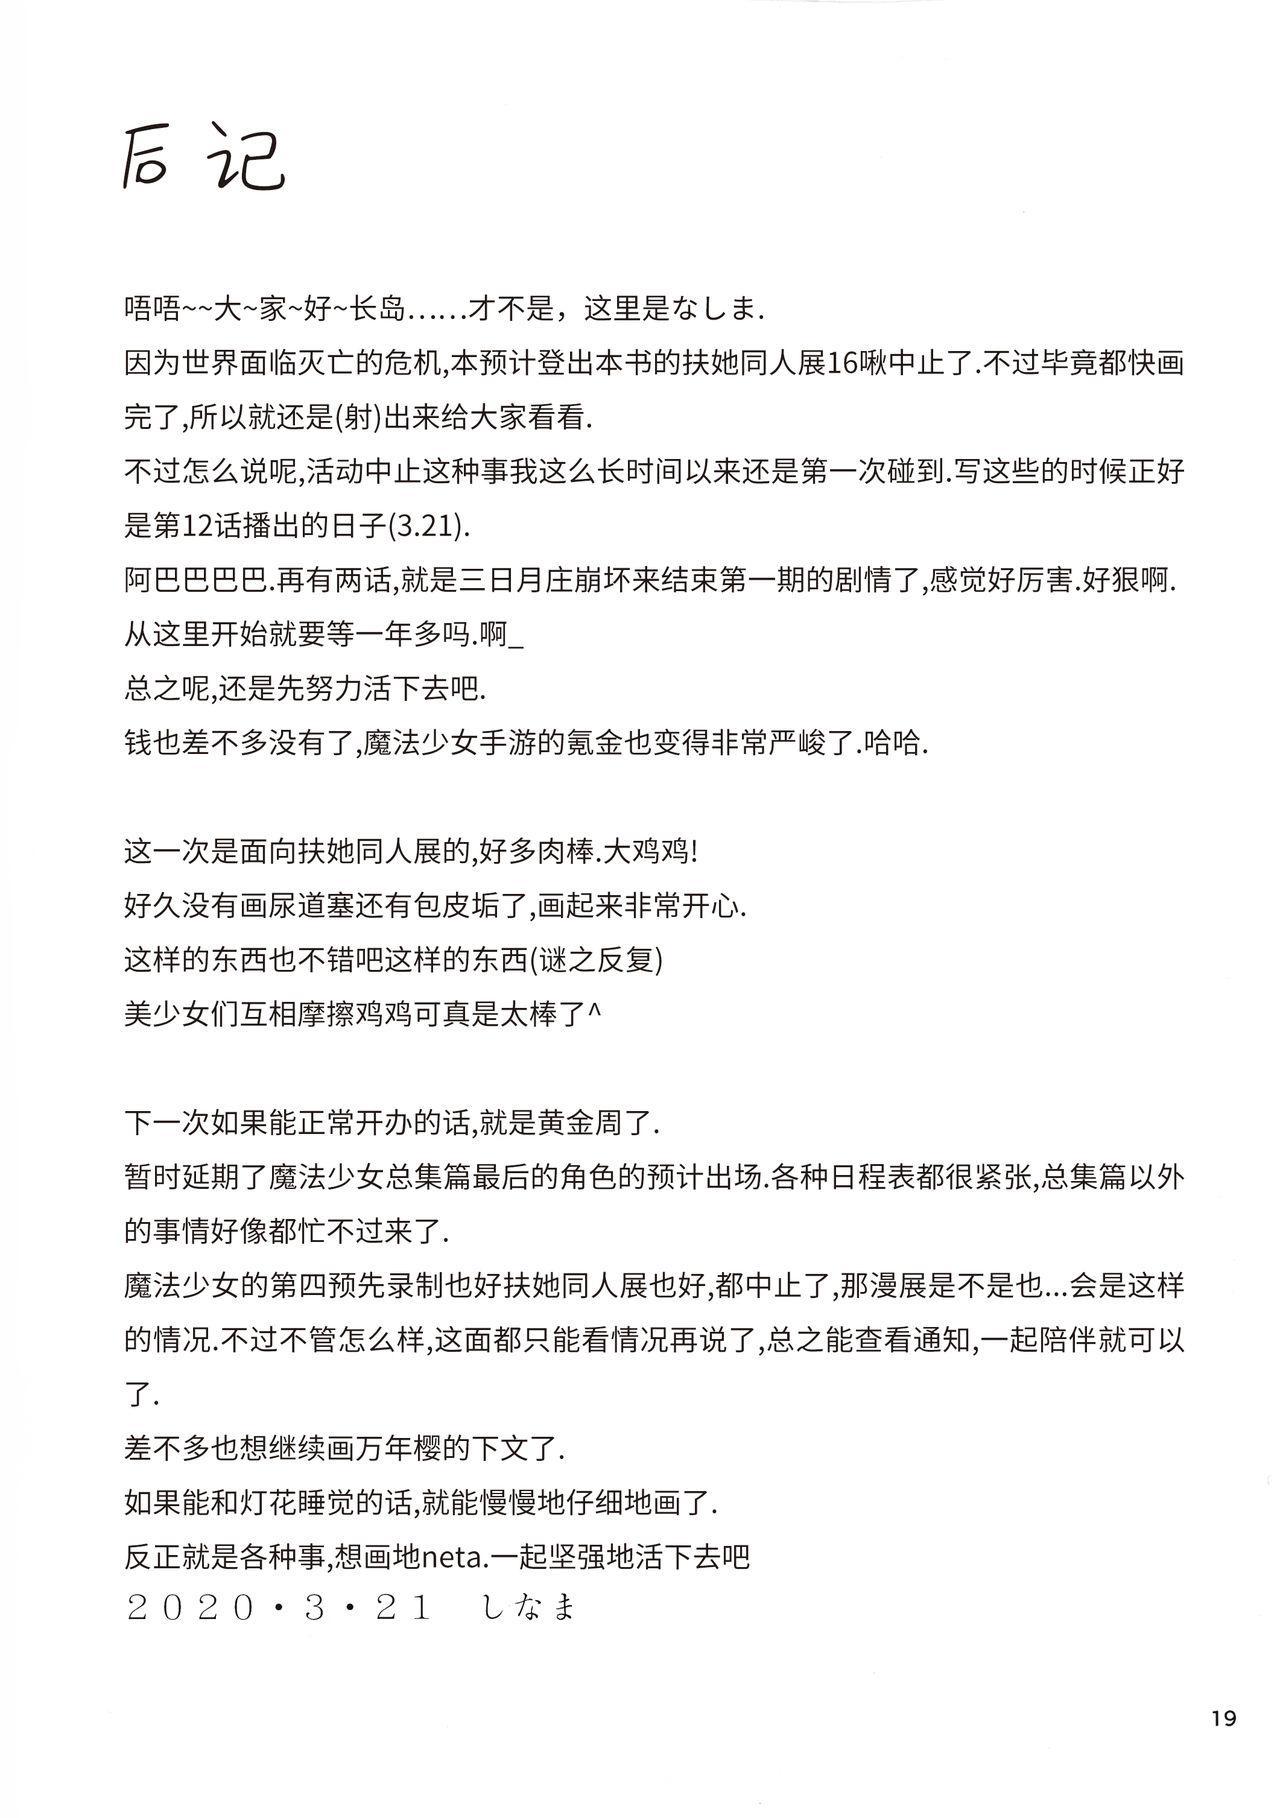 [KATAMARI-YA (Shinama)] Shiawase-no-Tamaki-iro (Puella Magi Madoka Magica Side Story: Magia Record) [Chinese] [靴下汉化组] 17